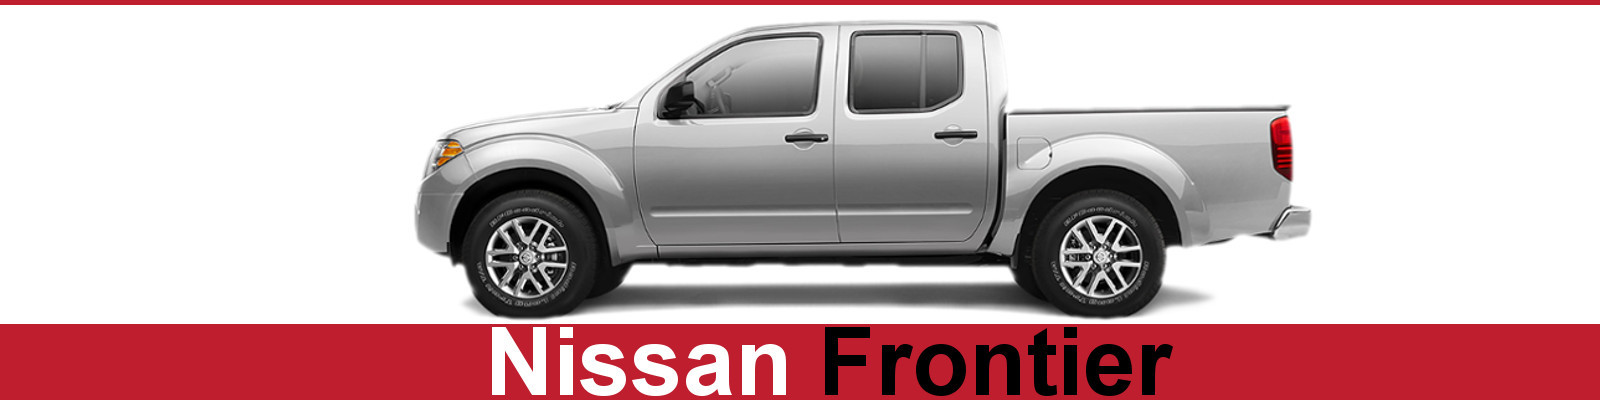 nissan trucks san antonio sales service parts. Black Bedroom Furniture Sets. Home Design Ideas